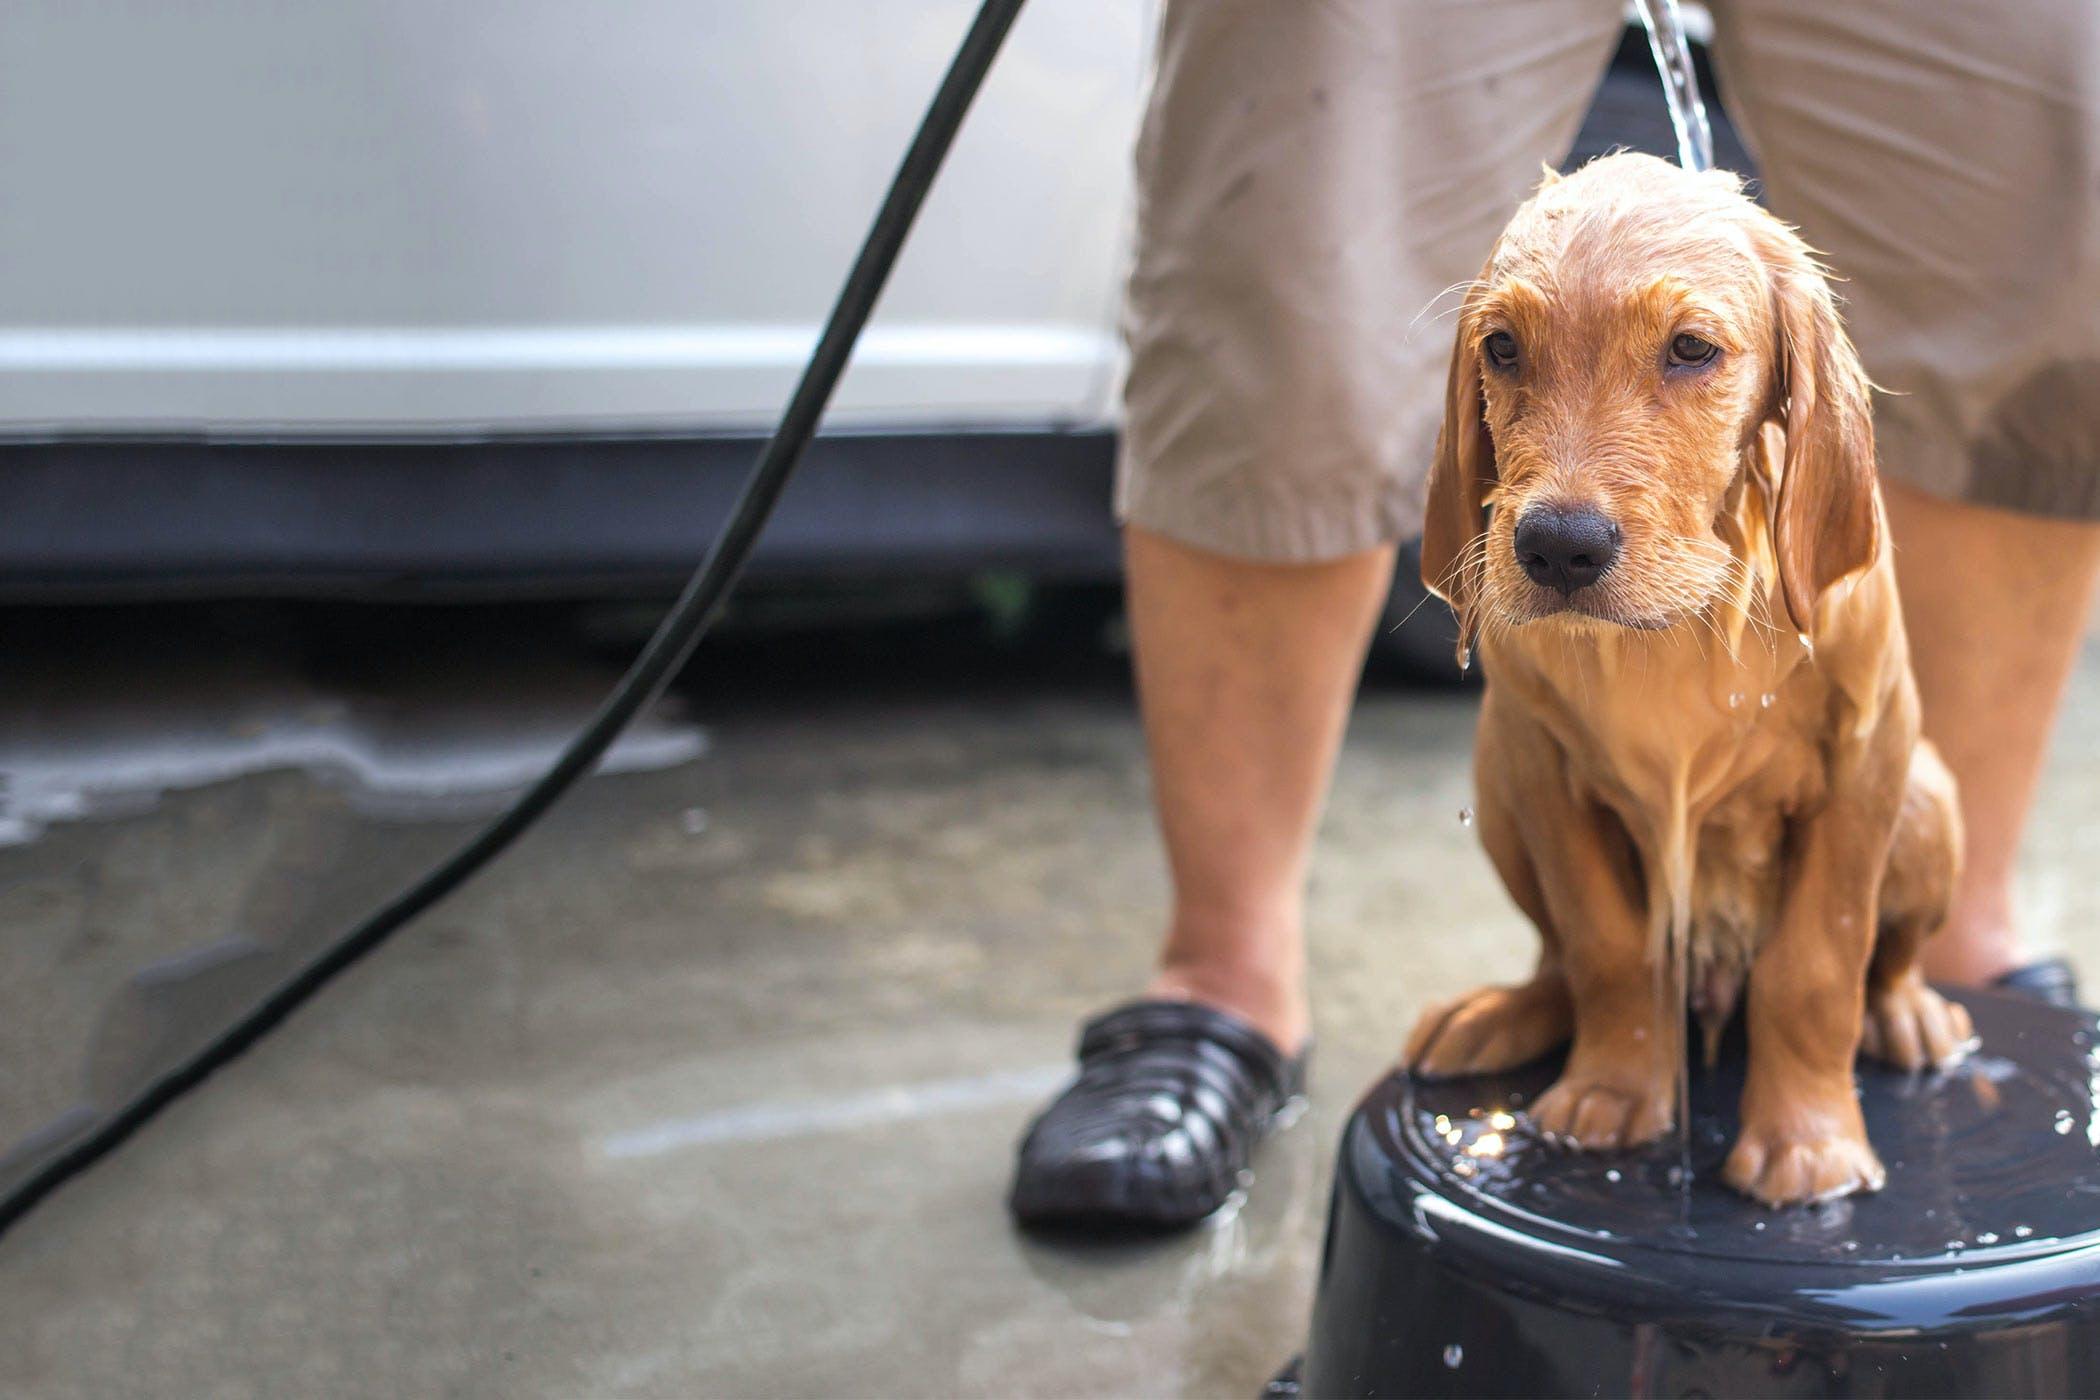 How To Bathe A Dog Sprayed By A Skunk